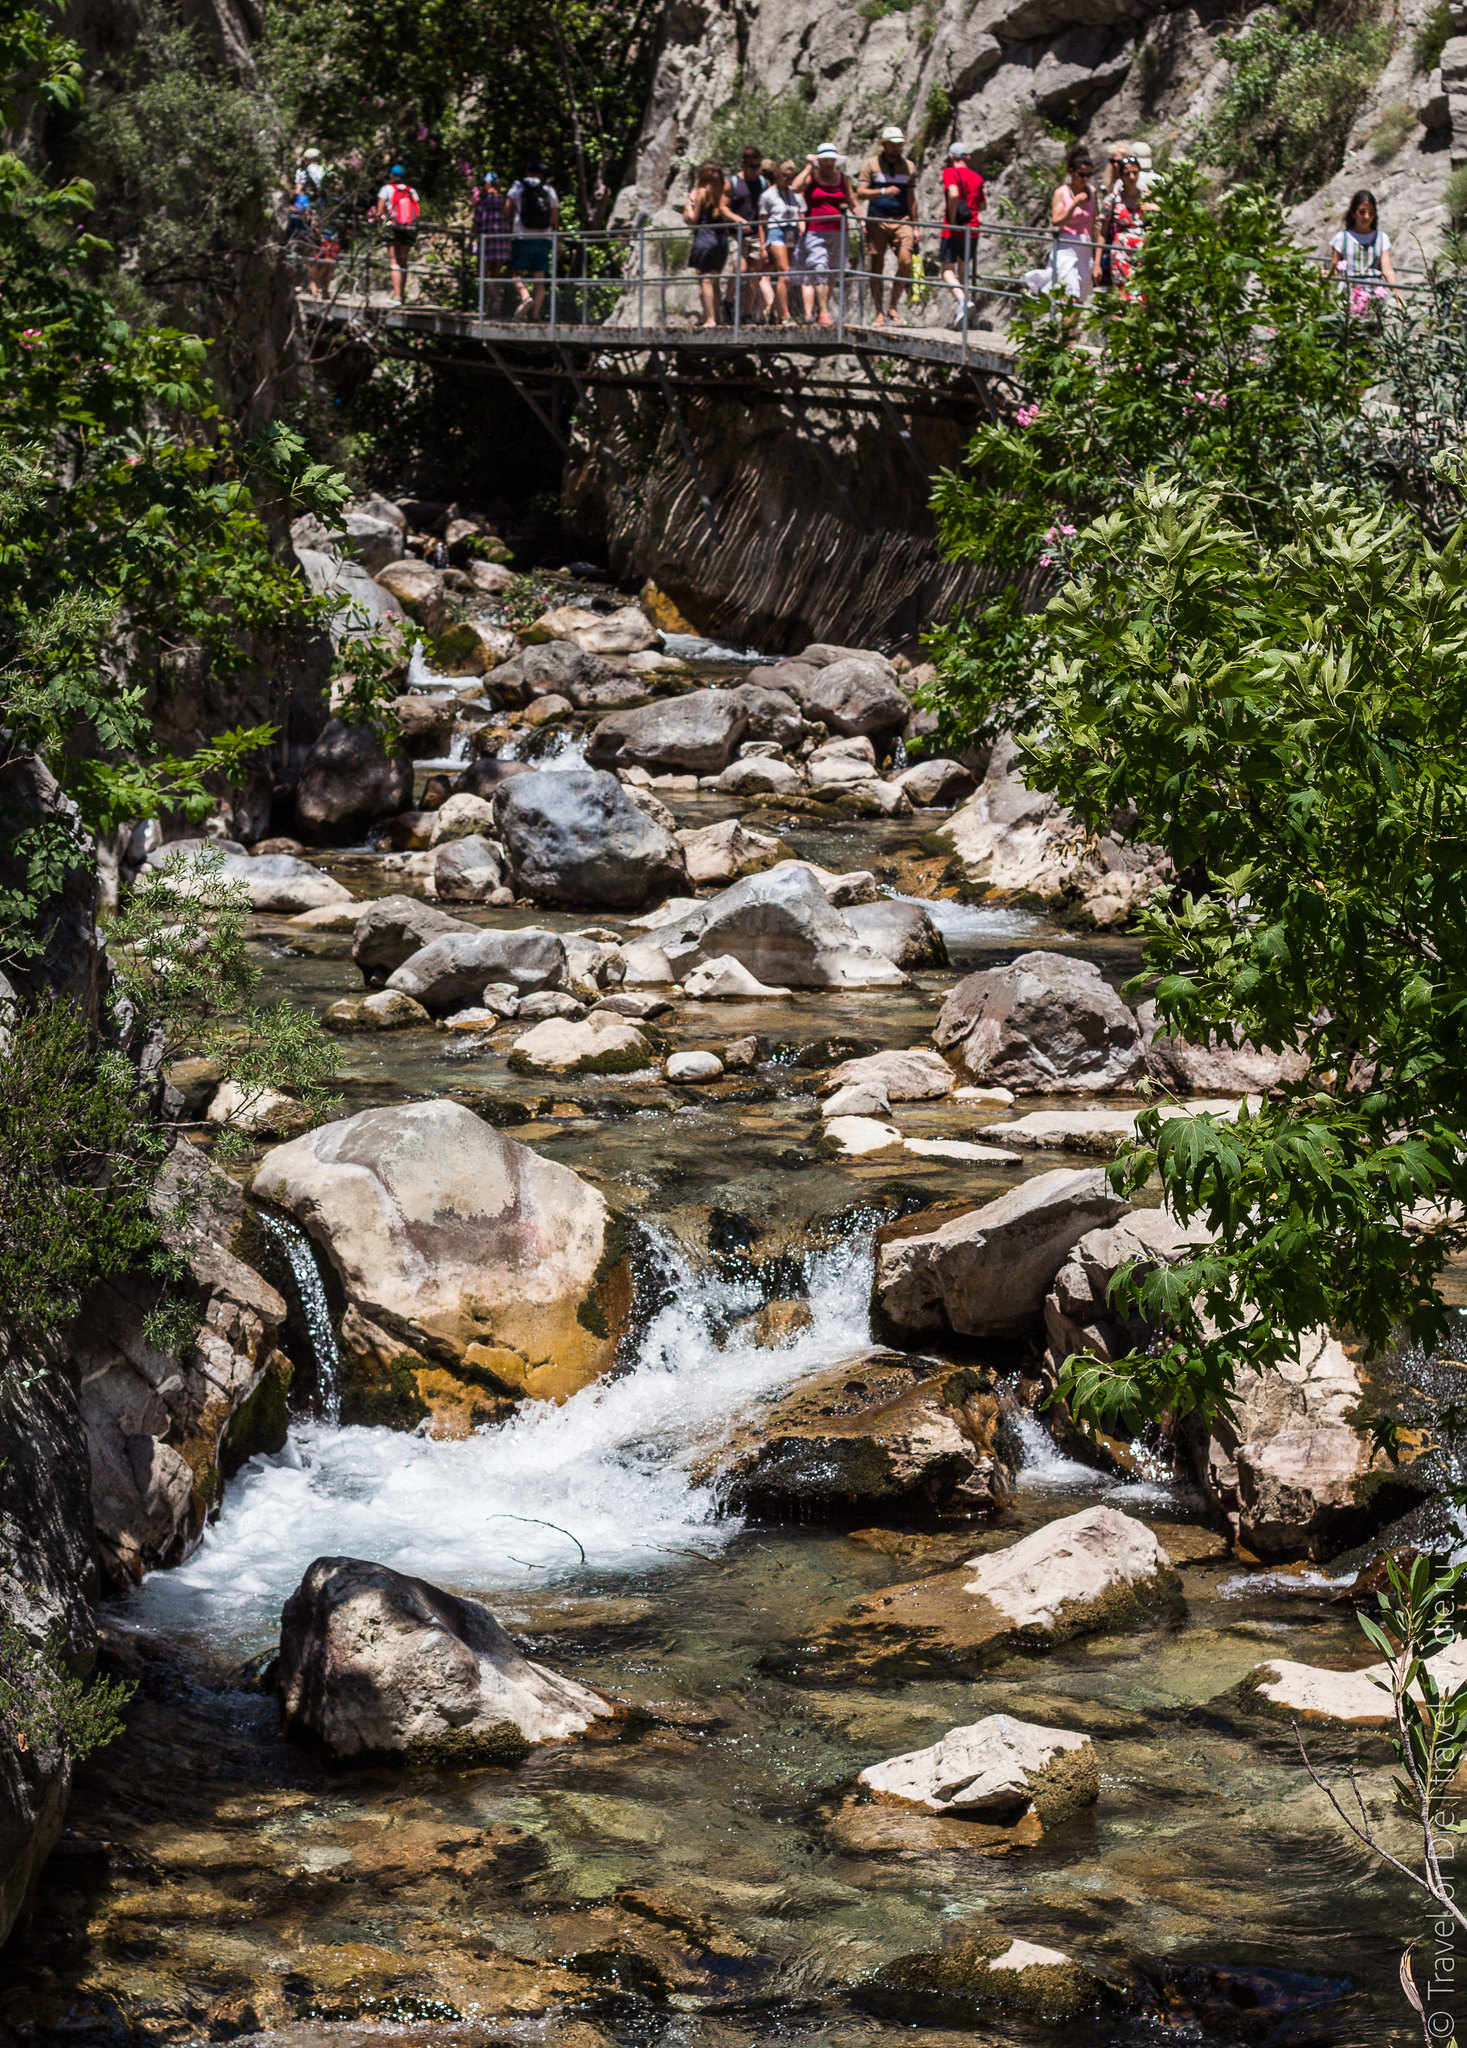 Sapadere-Canyon-Tour-экскурсия-в-каньон-сападере-6242